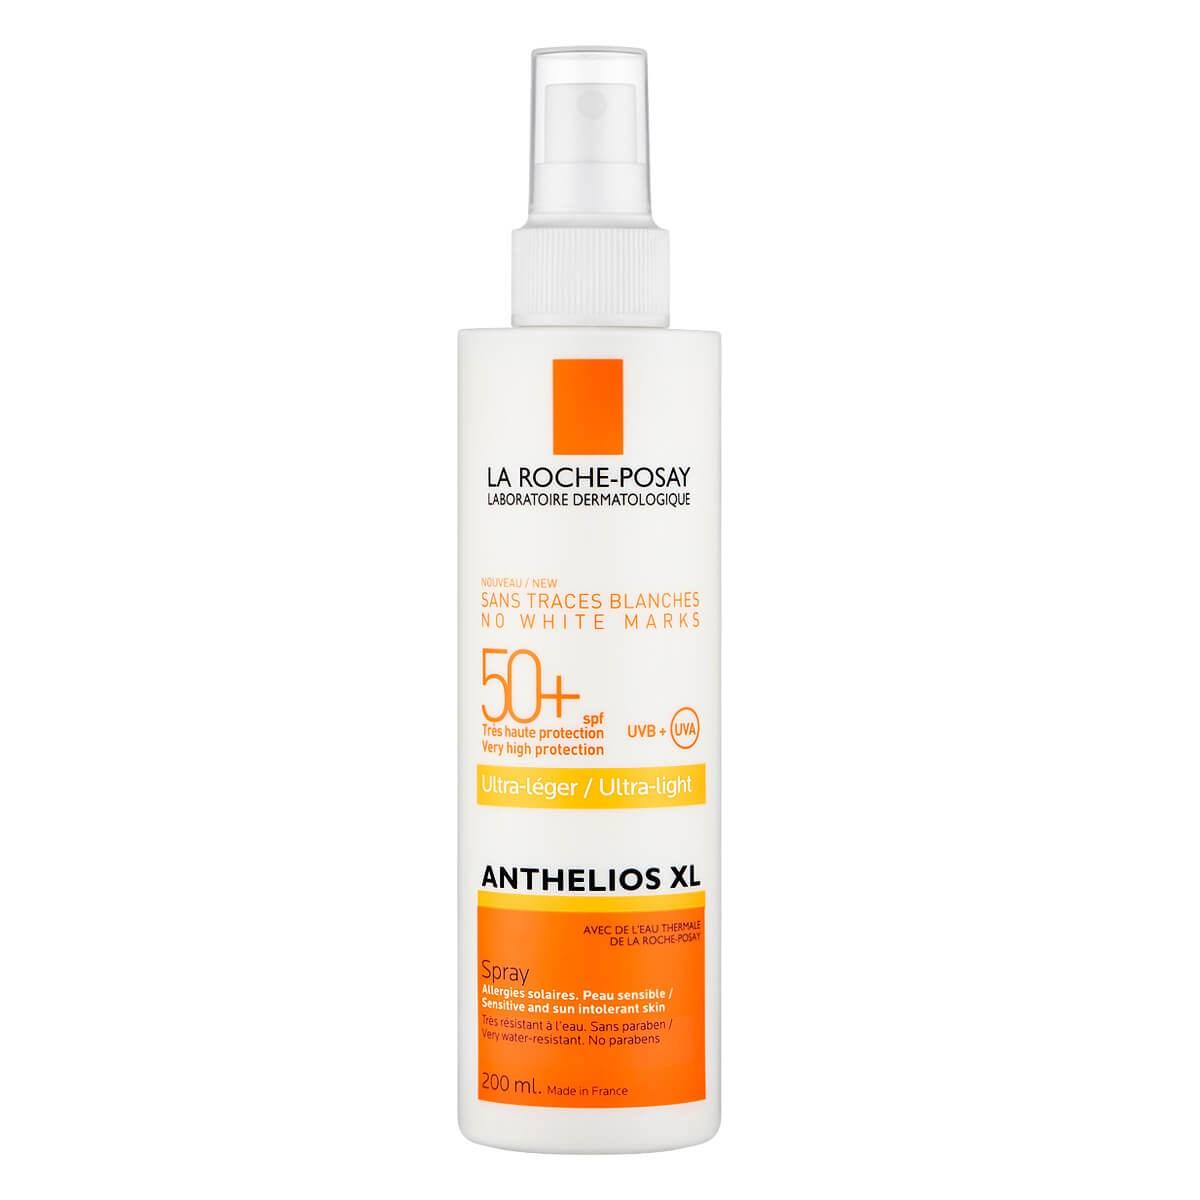 La Roche-Posay Anthelios Body Spray SPF50+